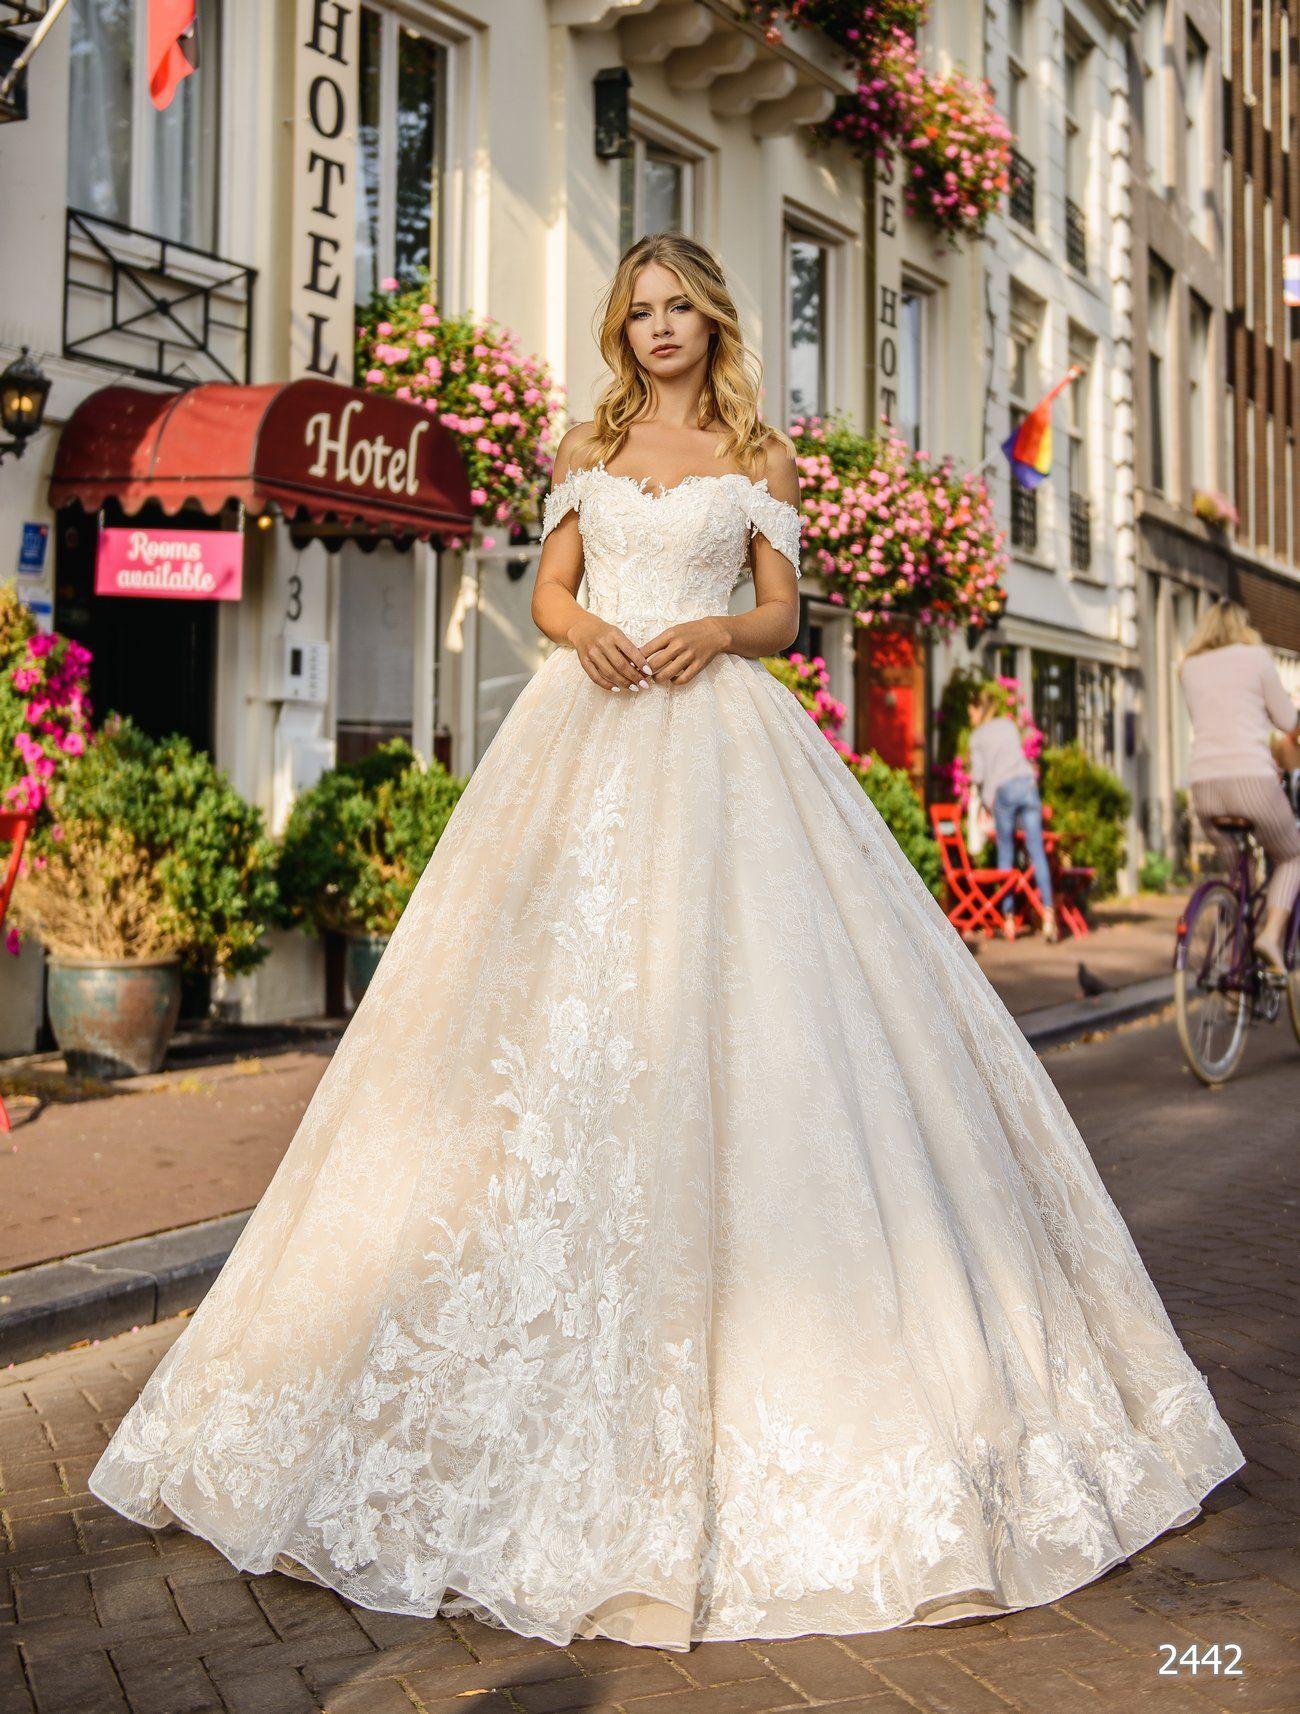 2442 Buy Wholesale Wedding Dresses From Pentelei: Ever Buying Wholesale Wedding Dresses At Reisefeber.org